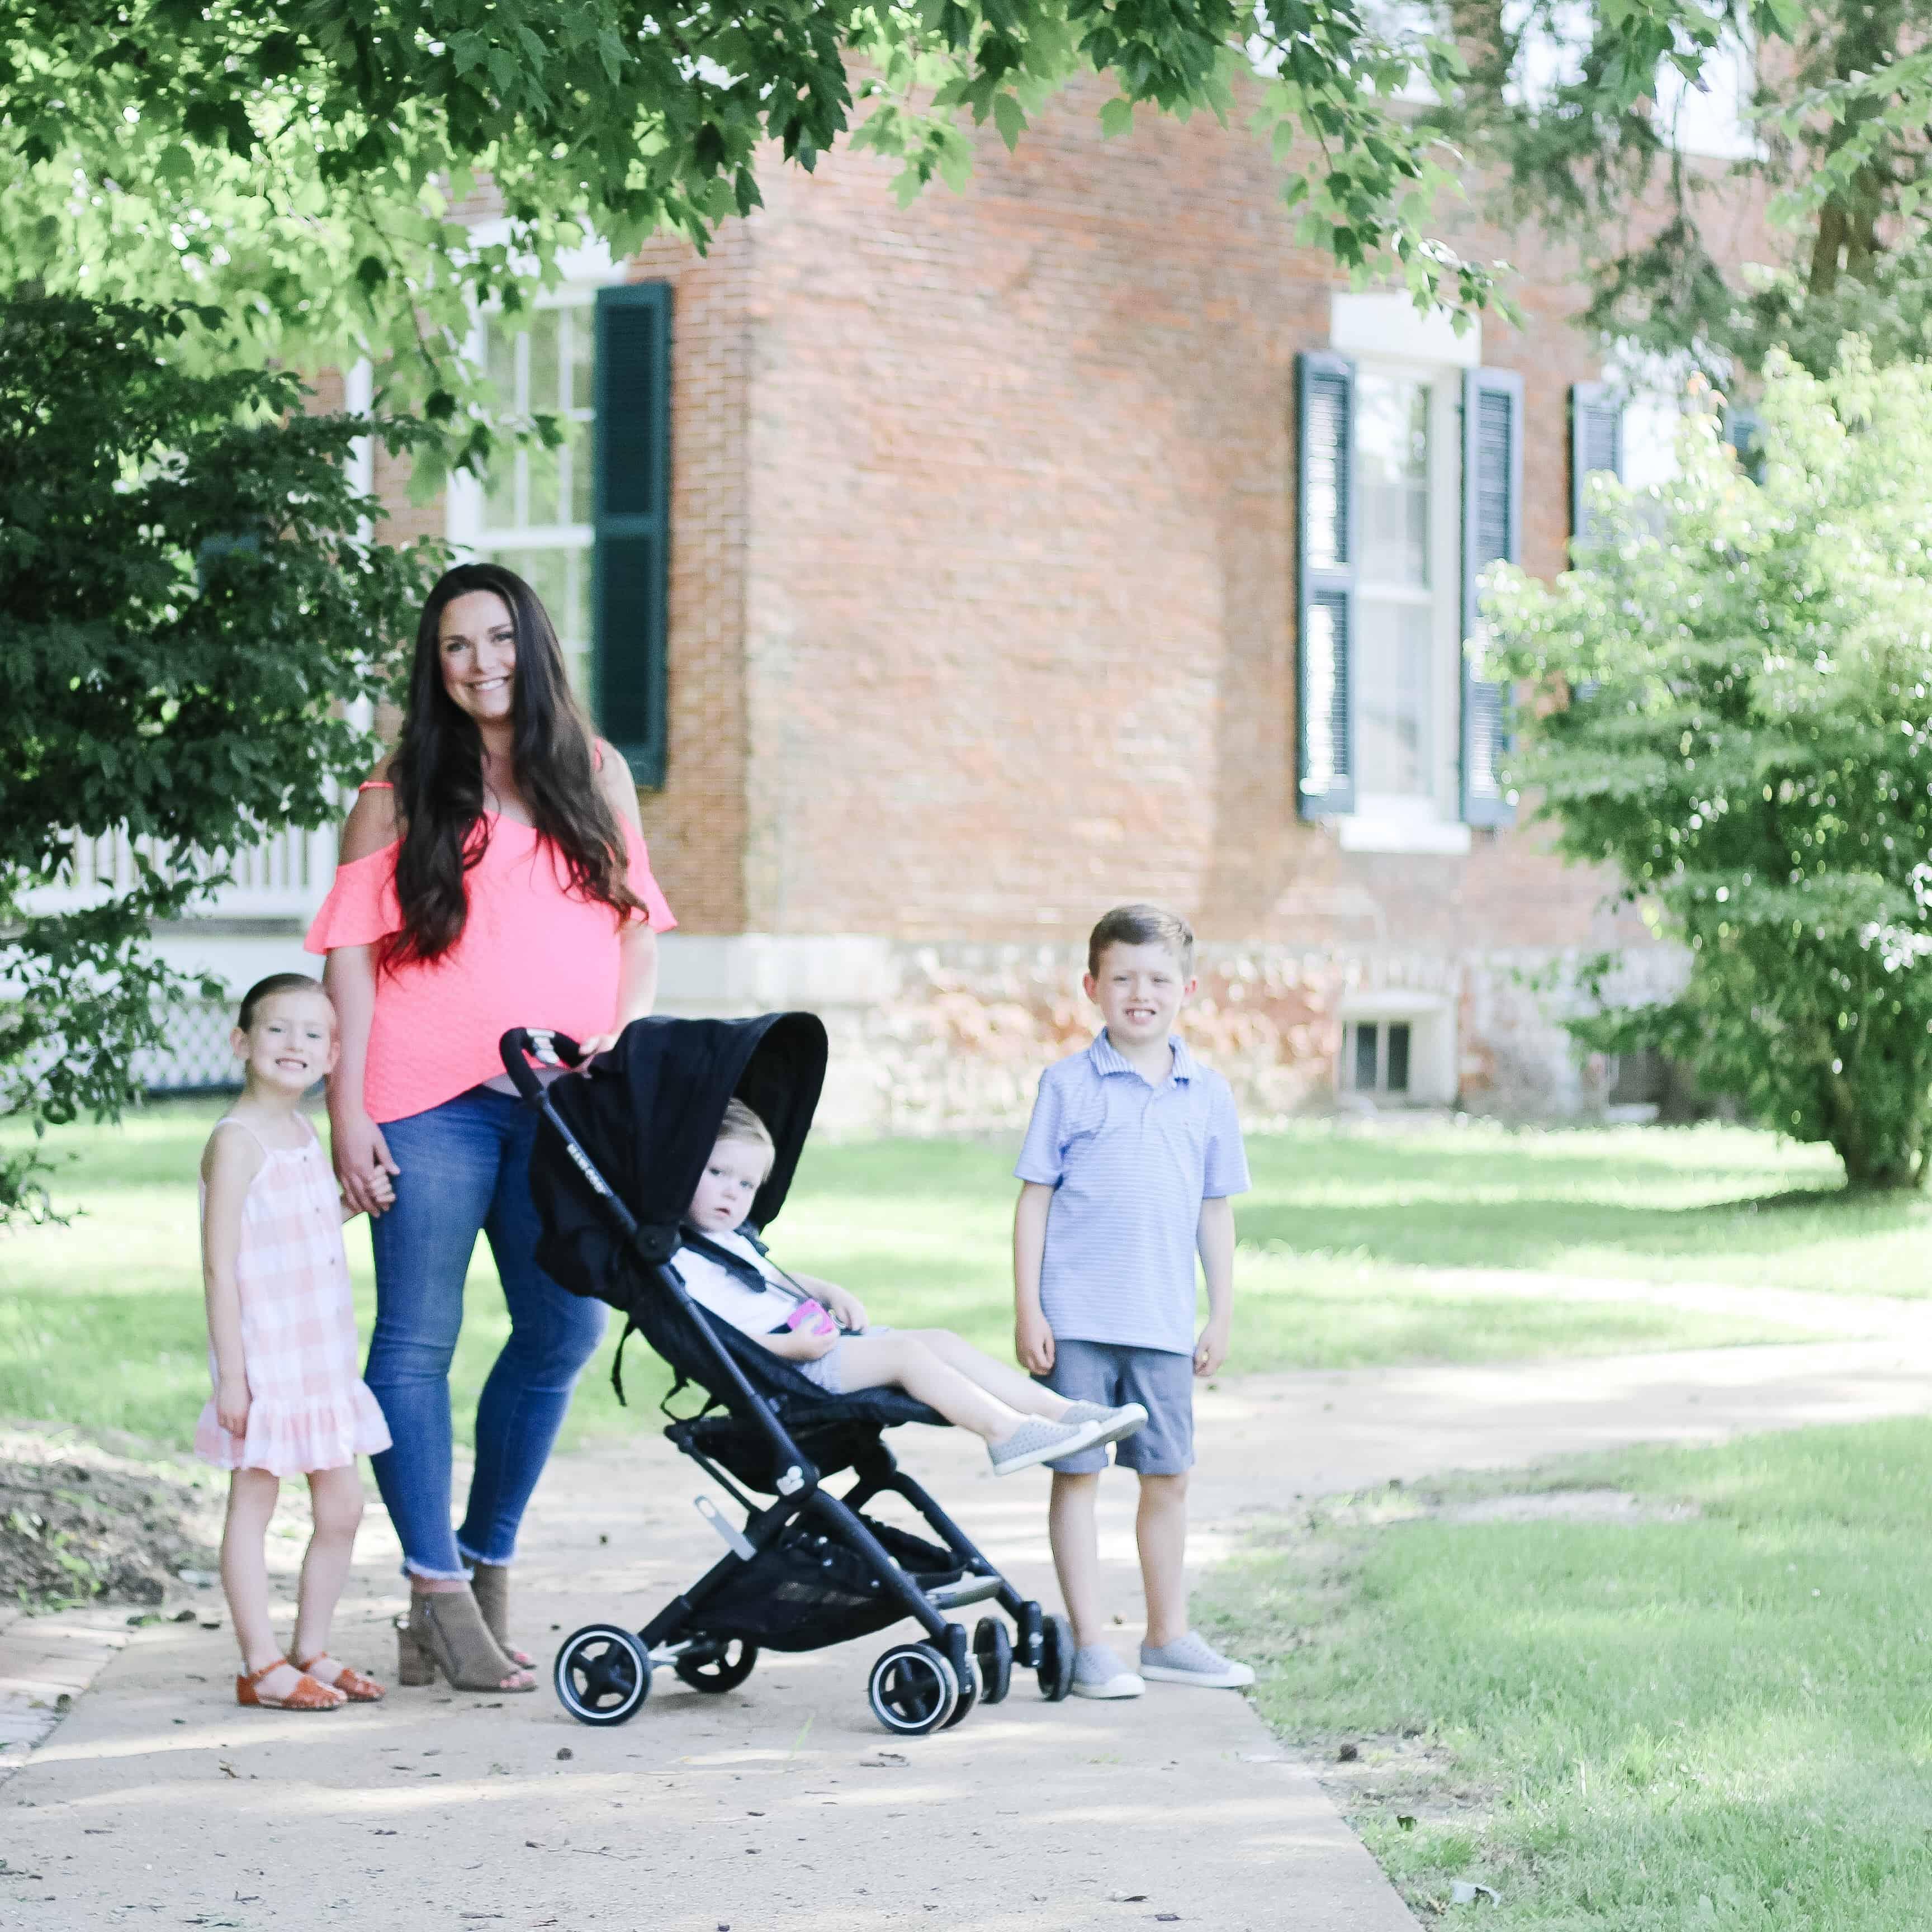 Mom and 3 kids